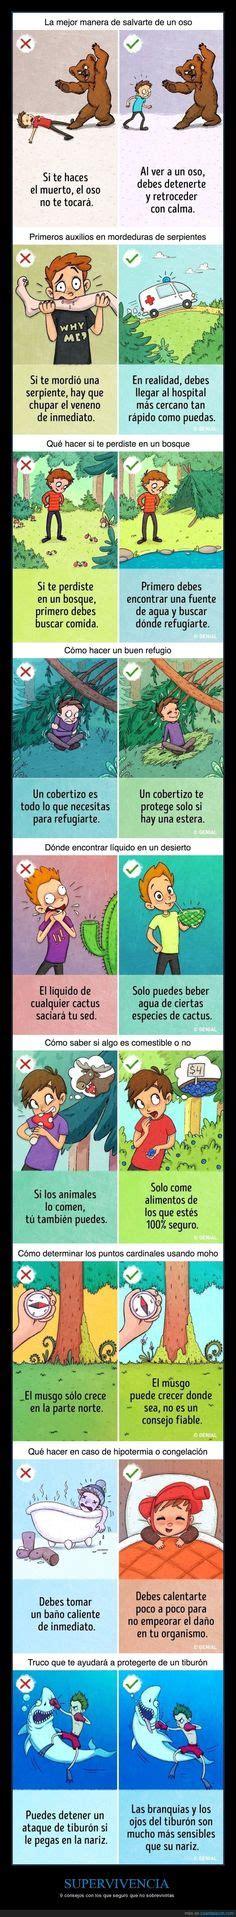 spanish health unit images health unit spanish